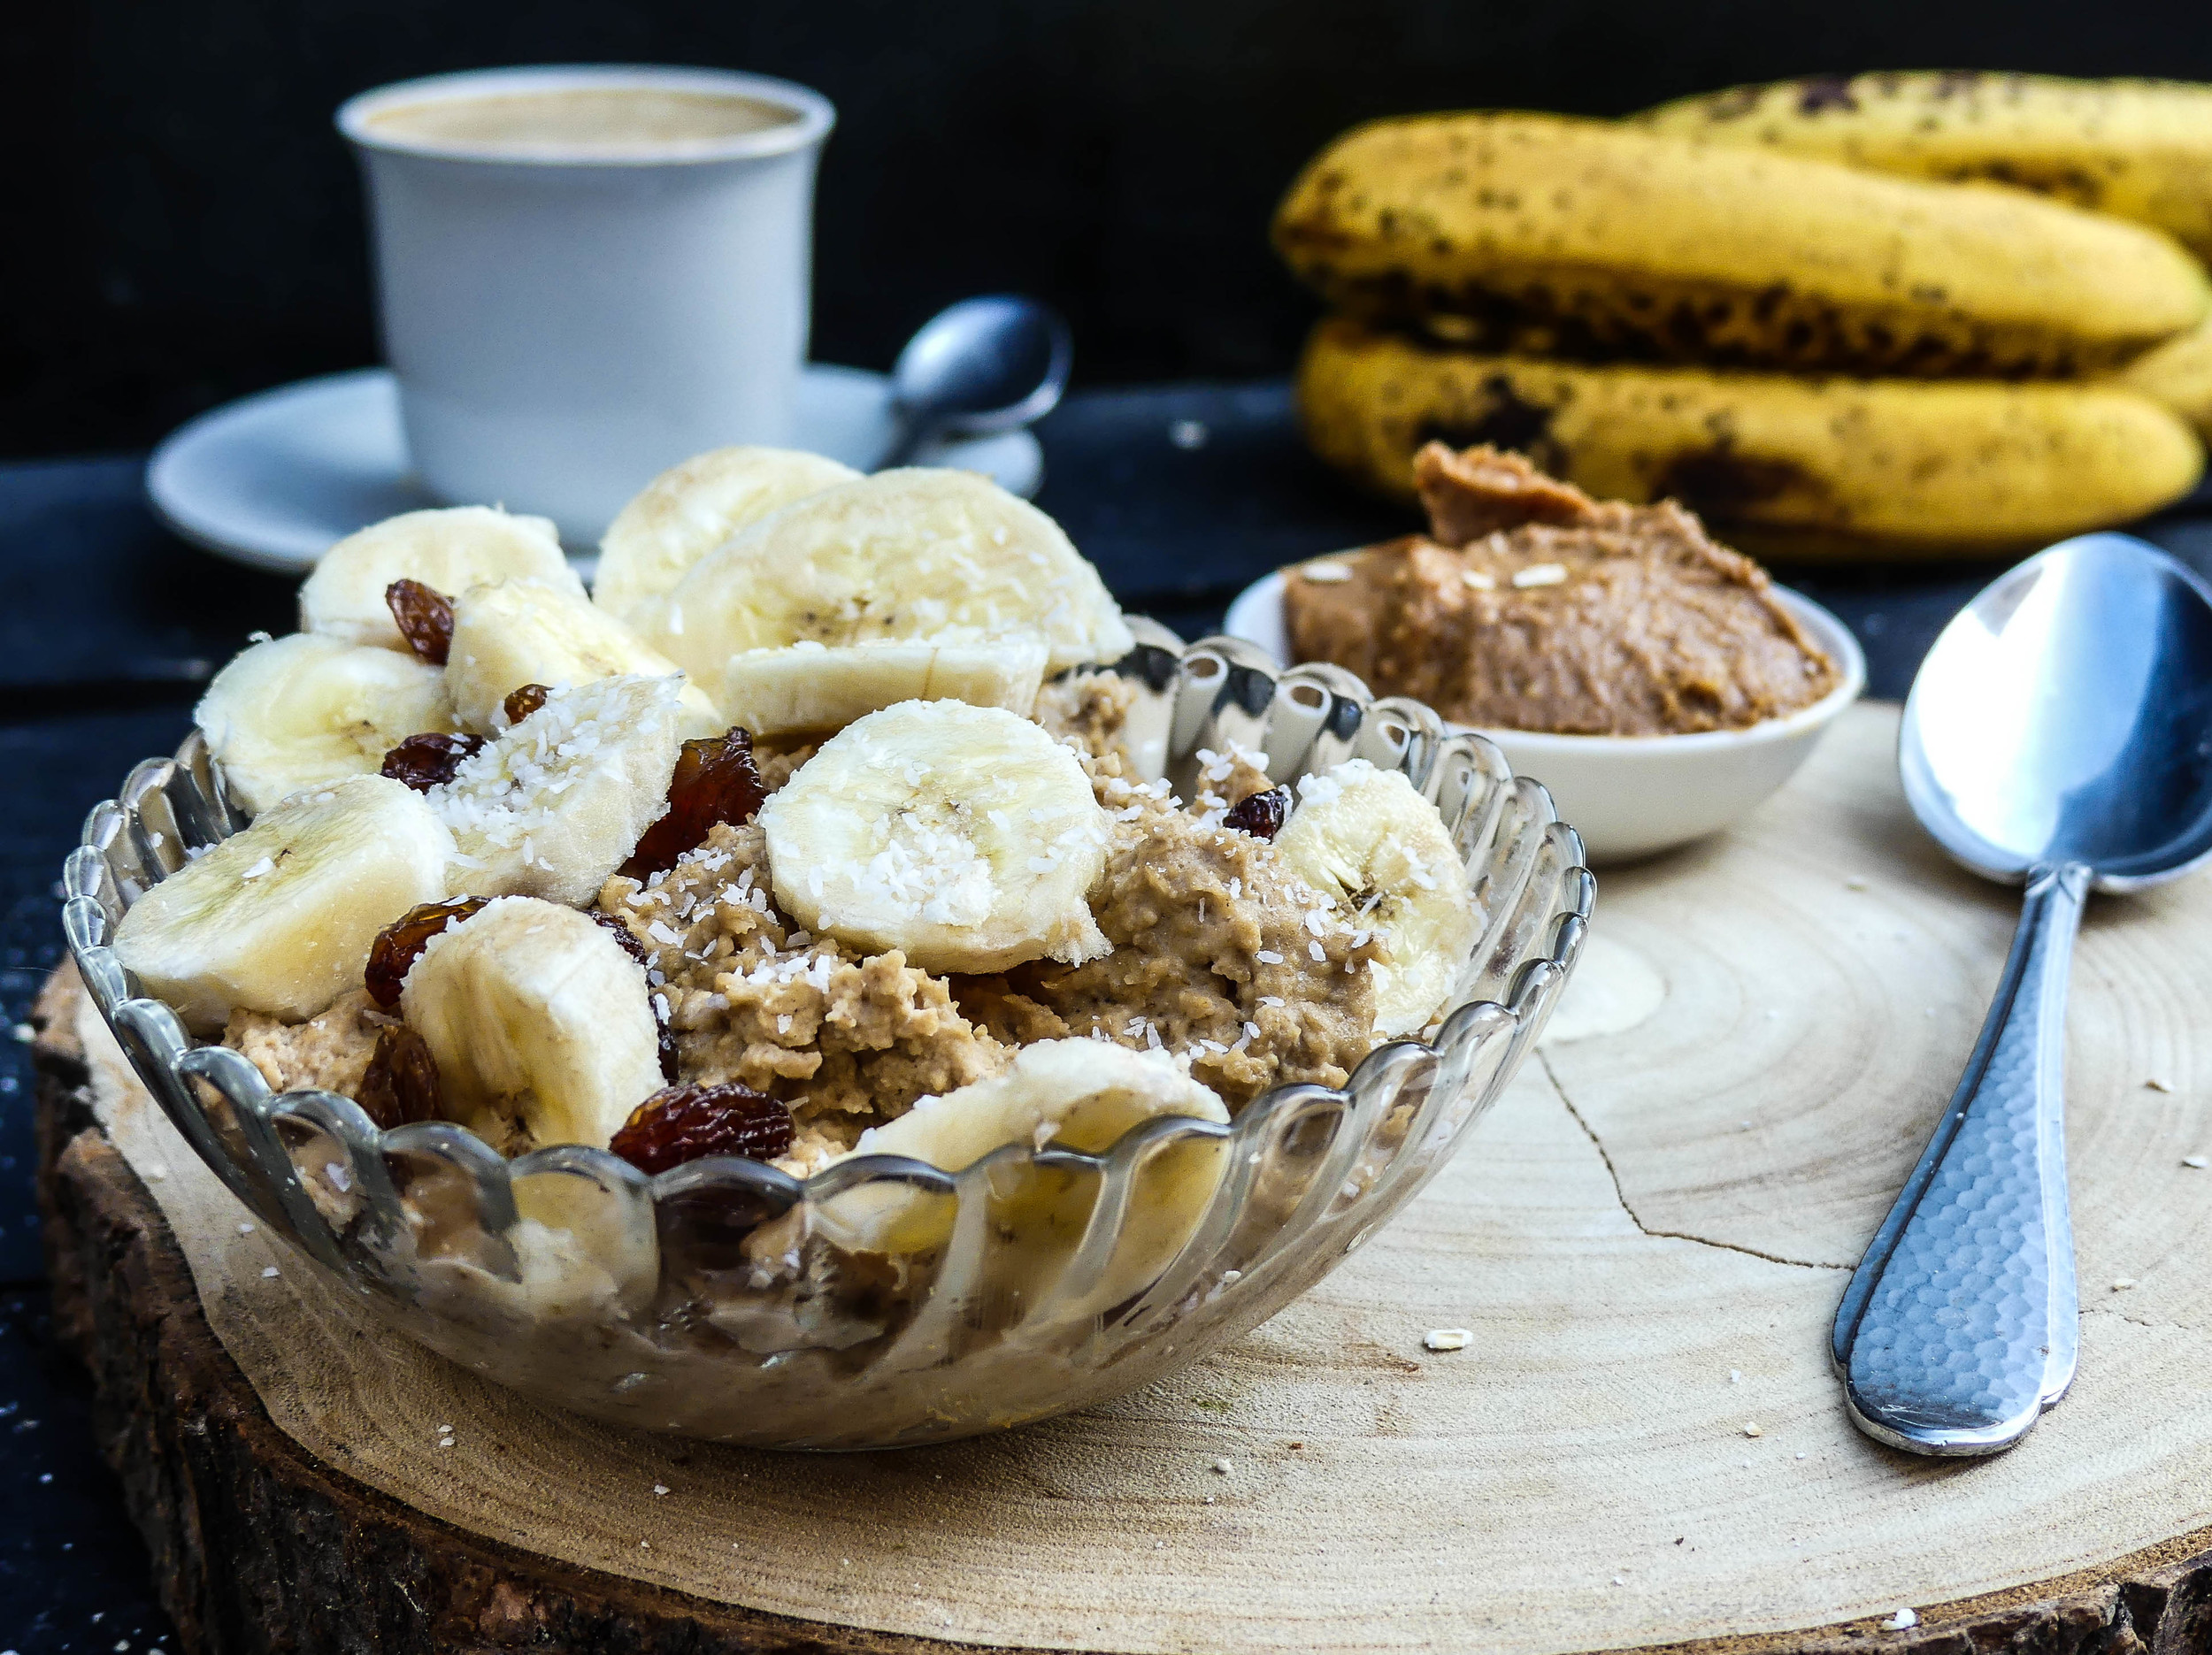 Kickstart havermout ontbijt met koffie